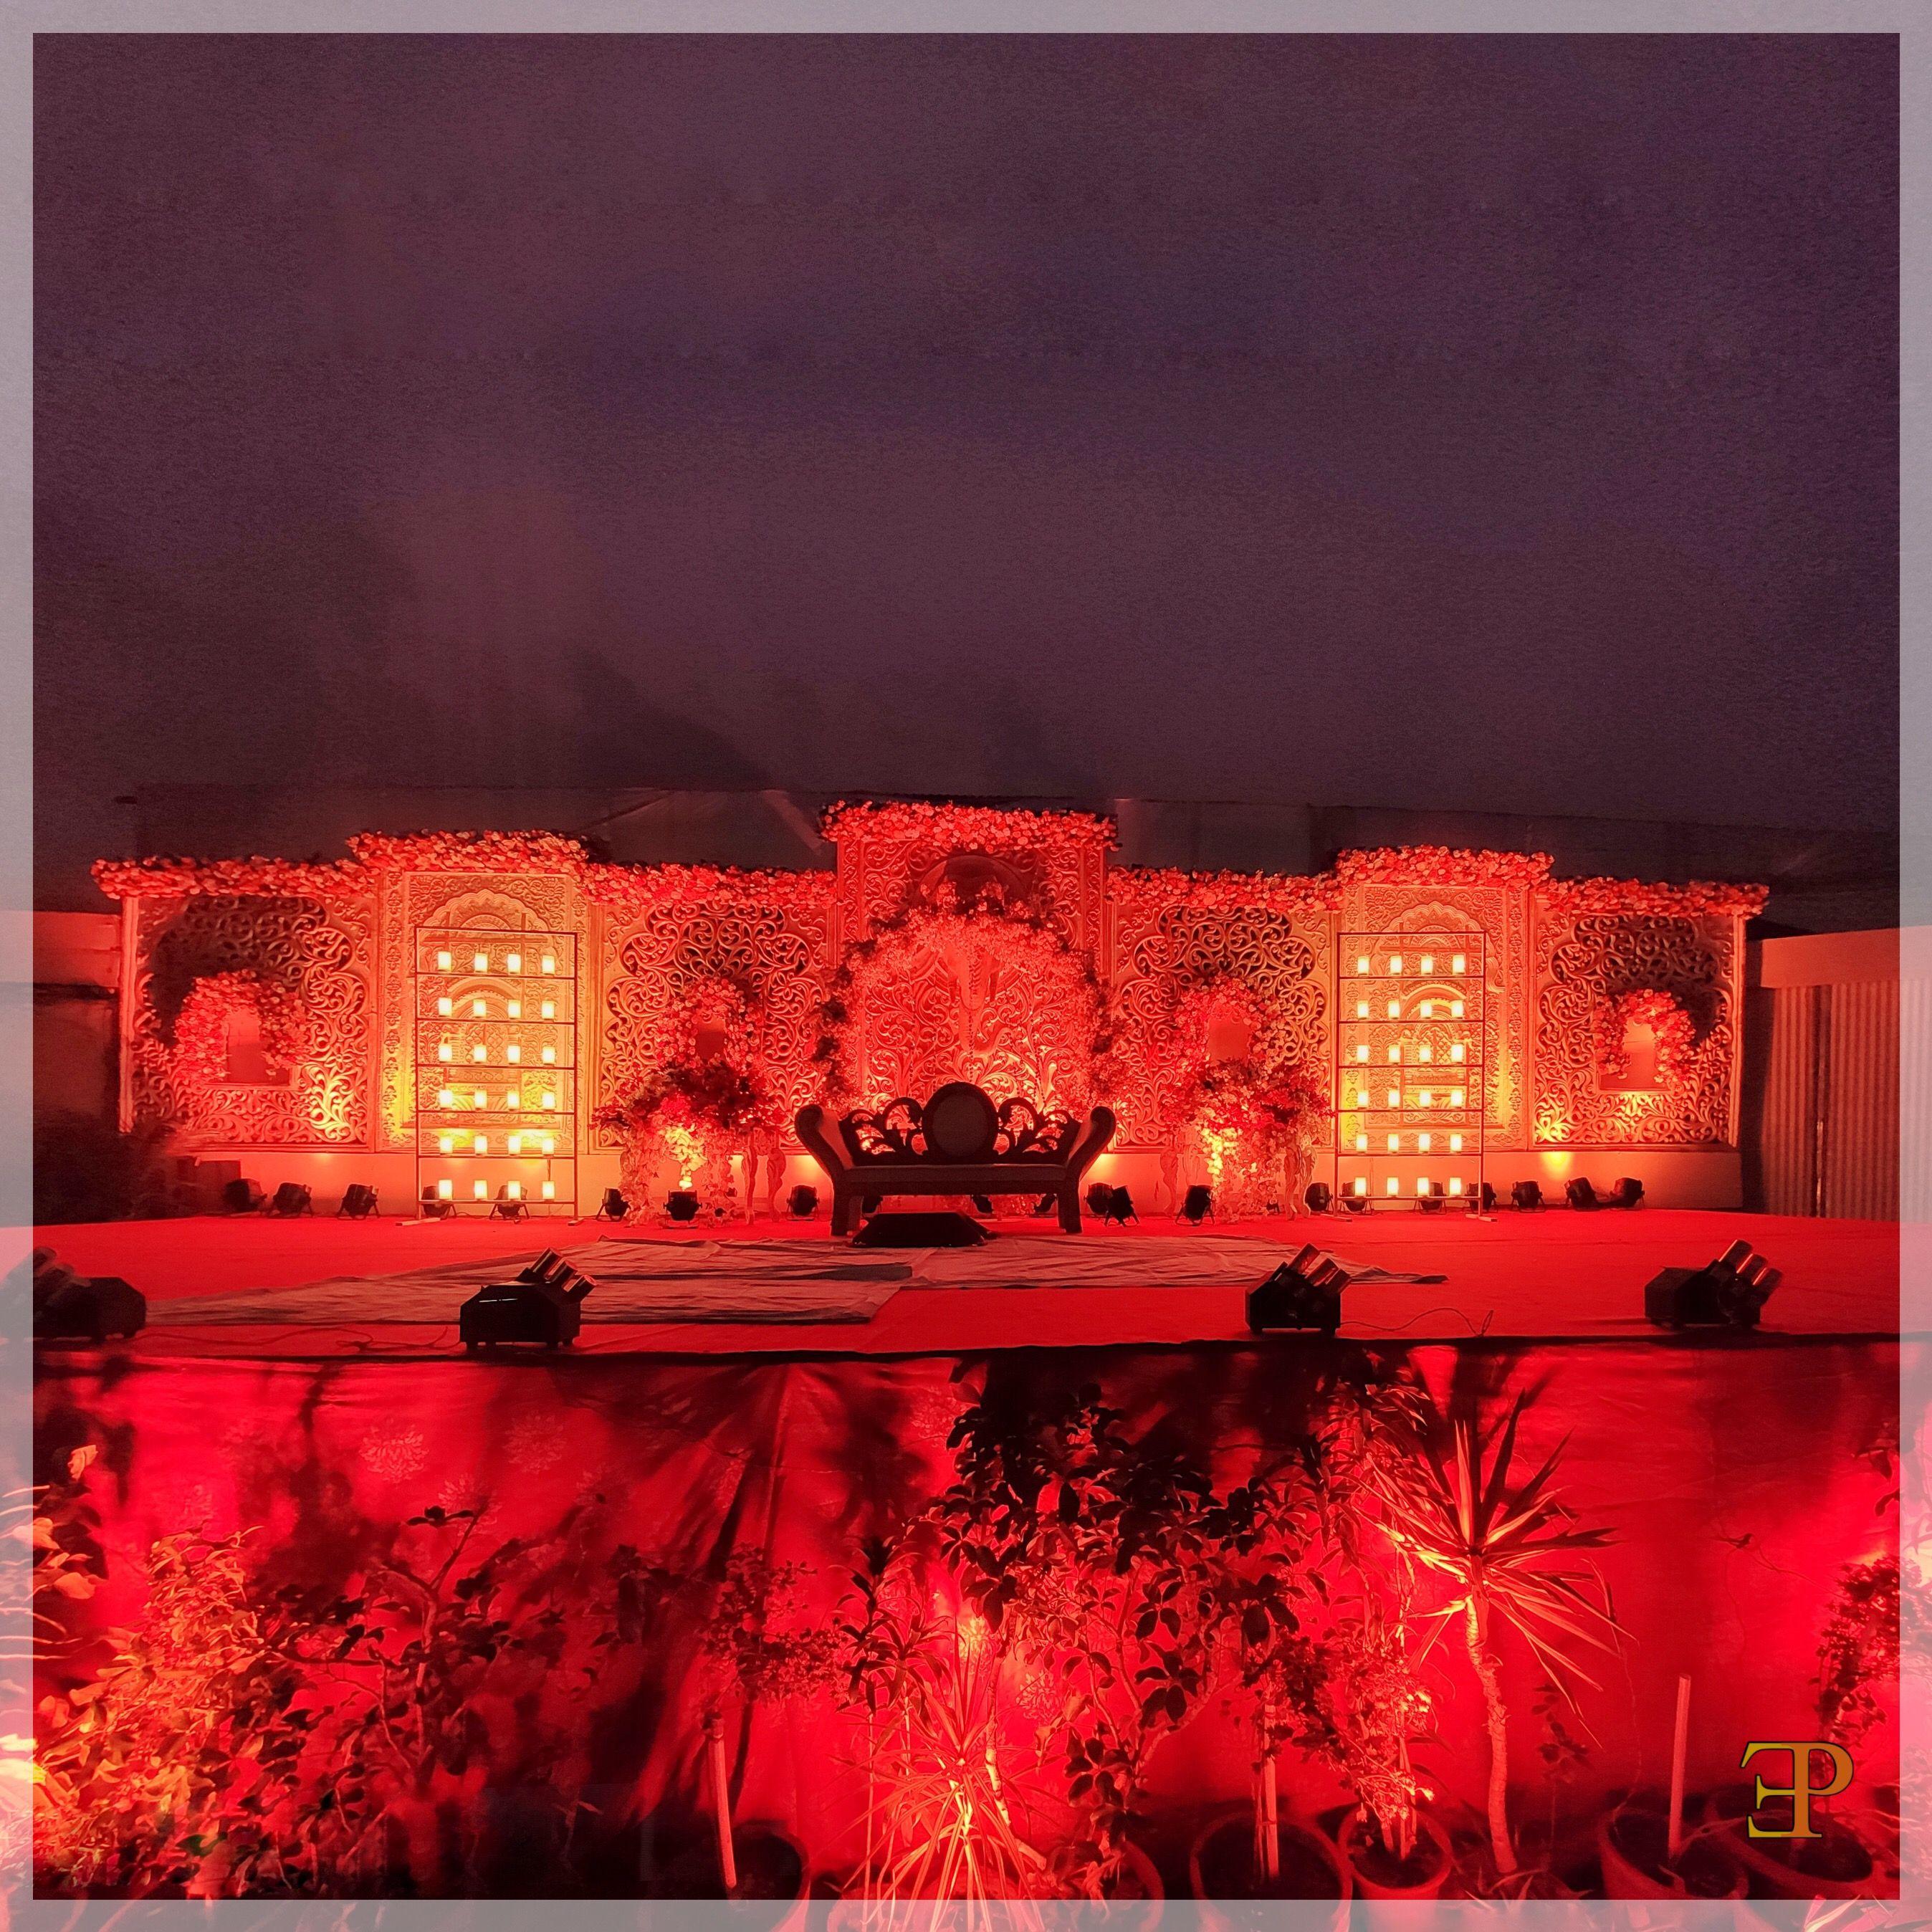 Venue : Rajwada Resort, Vaishali Nagar, Jaipur 302021  Planning & Managment : Eventophilia  Complimants are queries are WelCome. Eventophilia Contact Eventophilia@gmx.com +91 8824668114 +91 8949826860  #corporate #events #corporateevents #event #wedding #party #eventplanner #love #photography #design #weddings #entertainment #catering #instagood #eventplanning #fun #birthday #video #music #portrait #conference #india #like #photographer #inspiration #happy #photo #professional #food